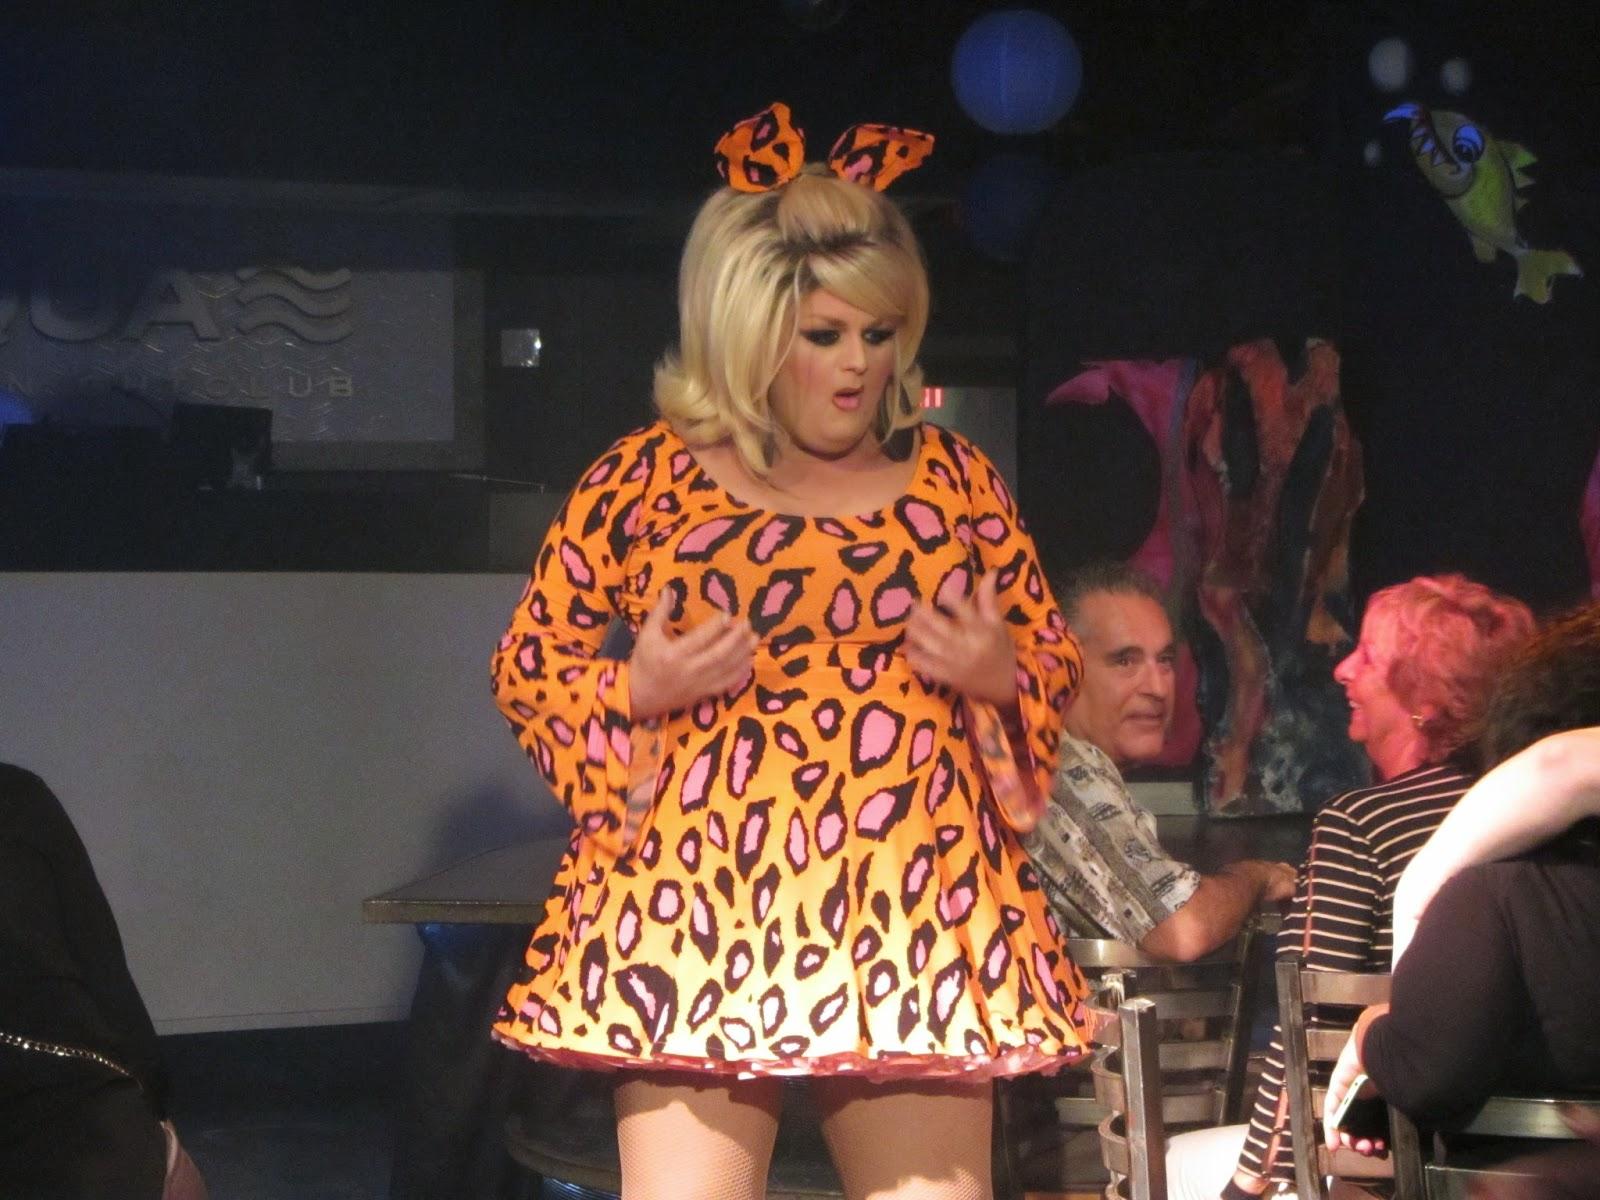 Transvestite club key west fl